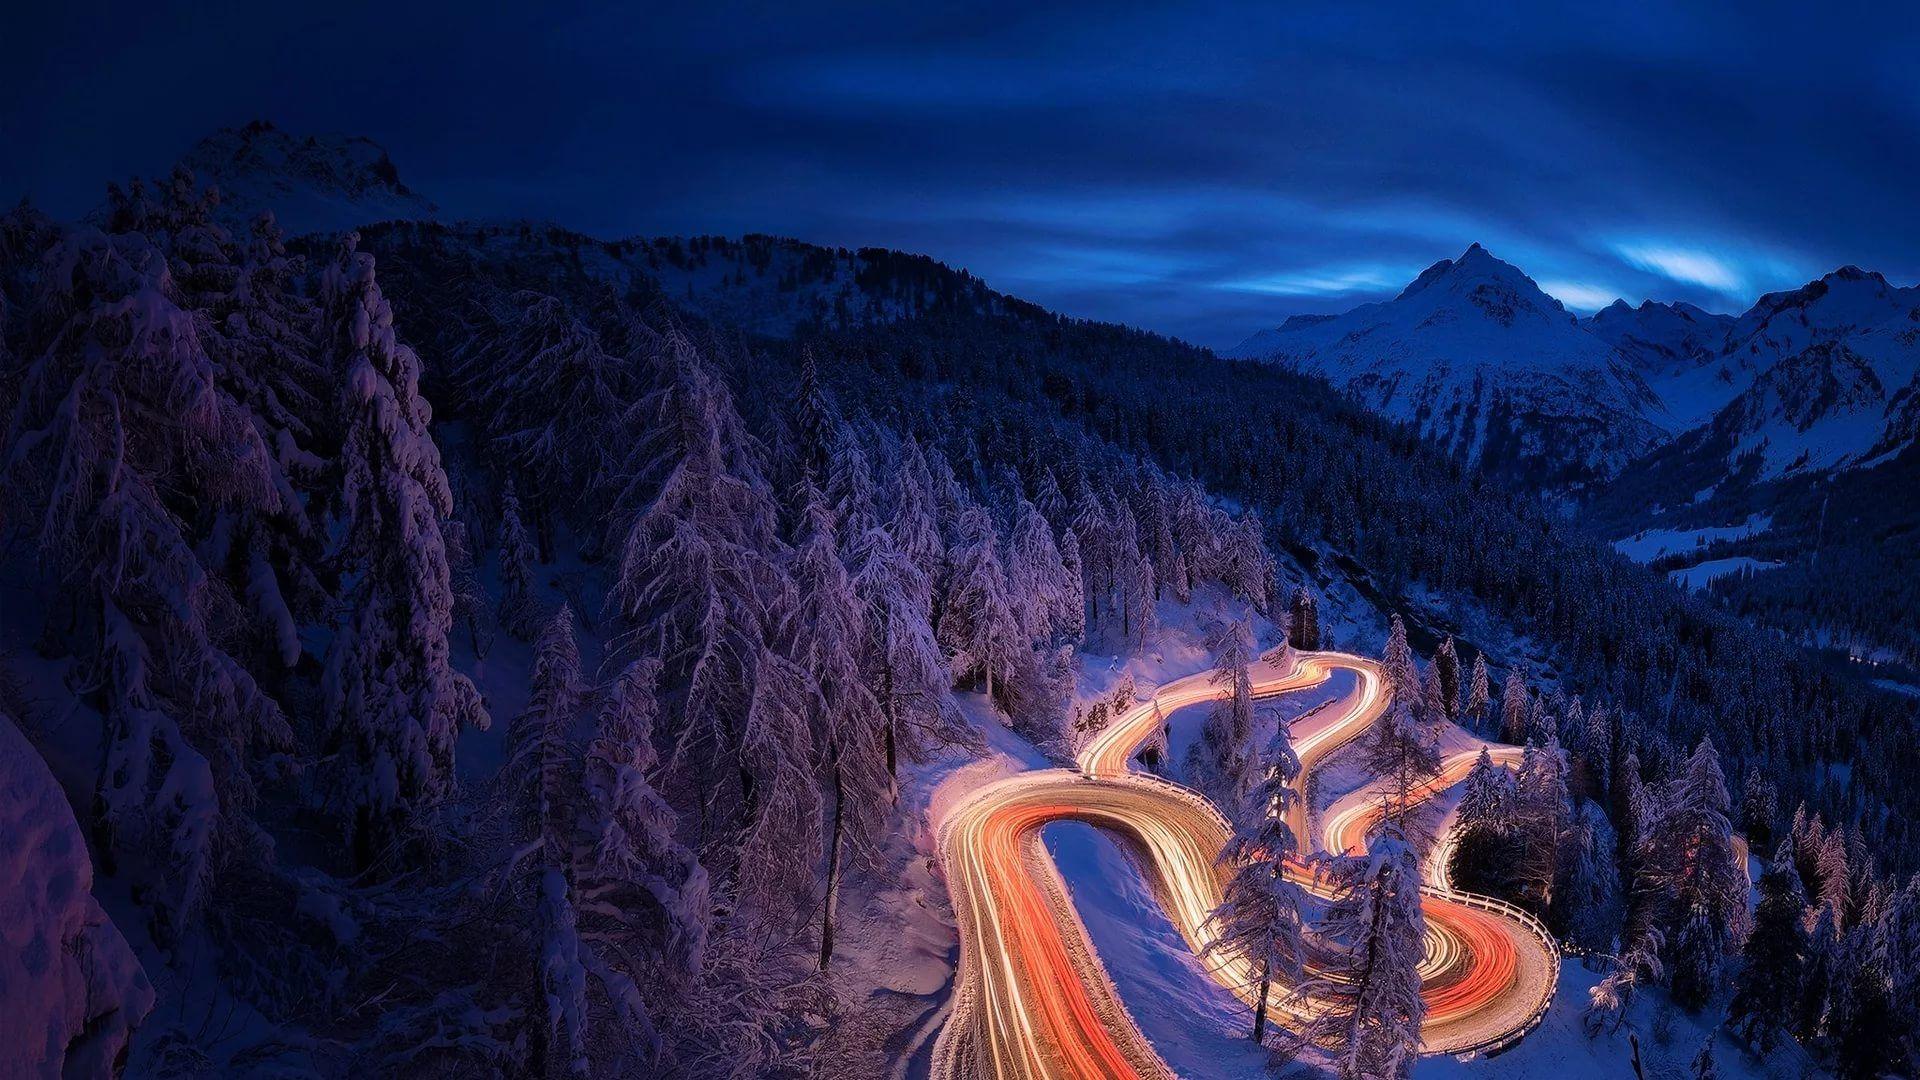 happy wallpaper,sky,mountain,geological phenomenon,landscape,night